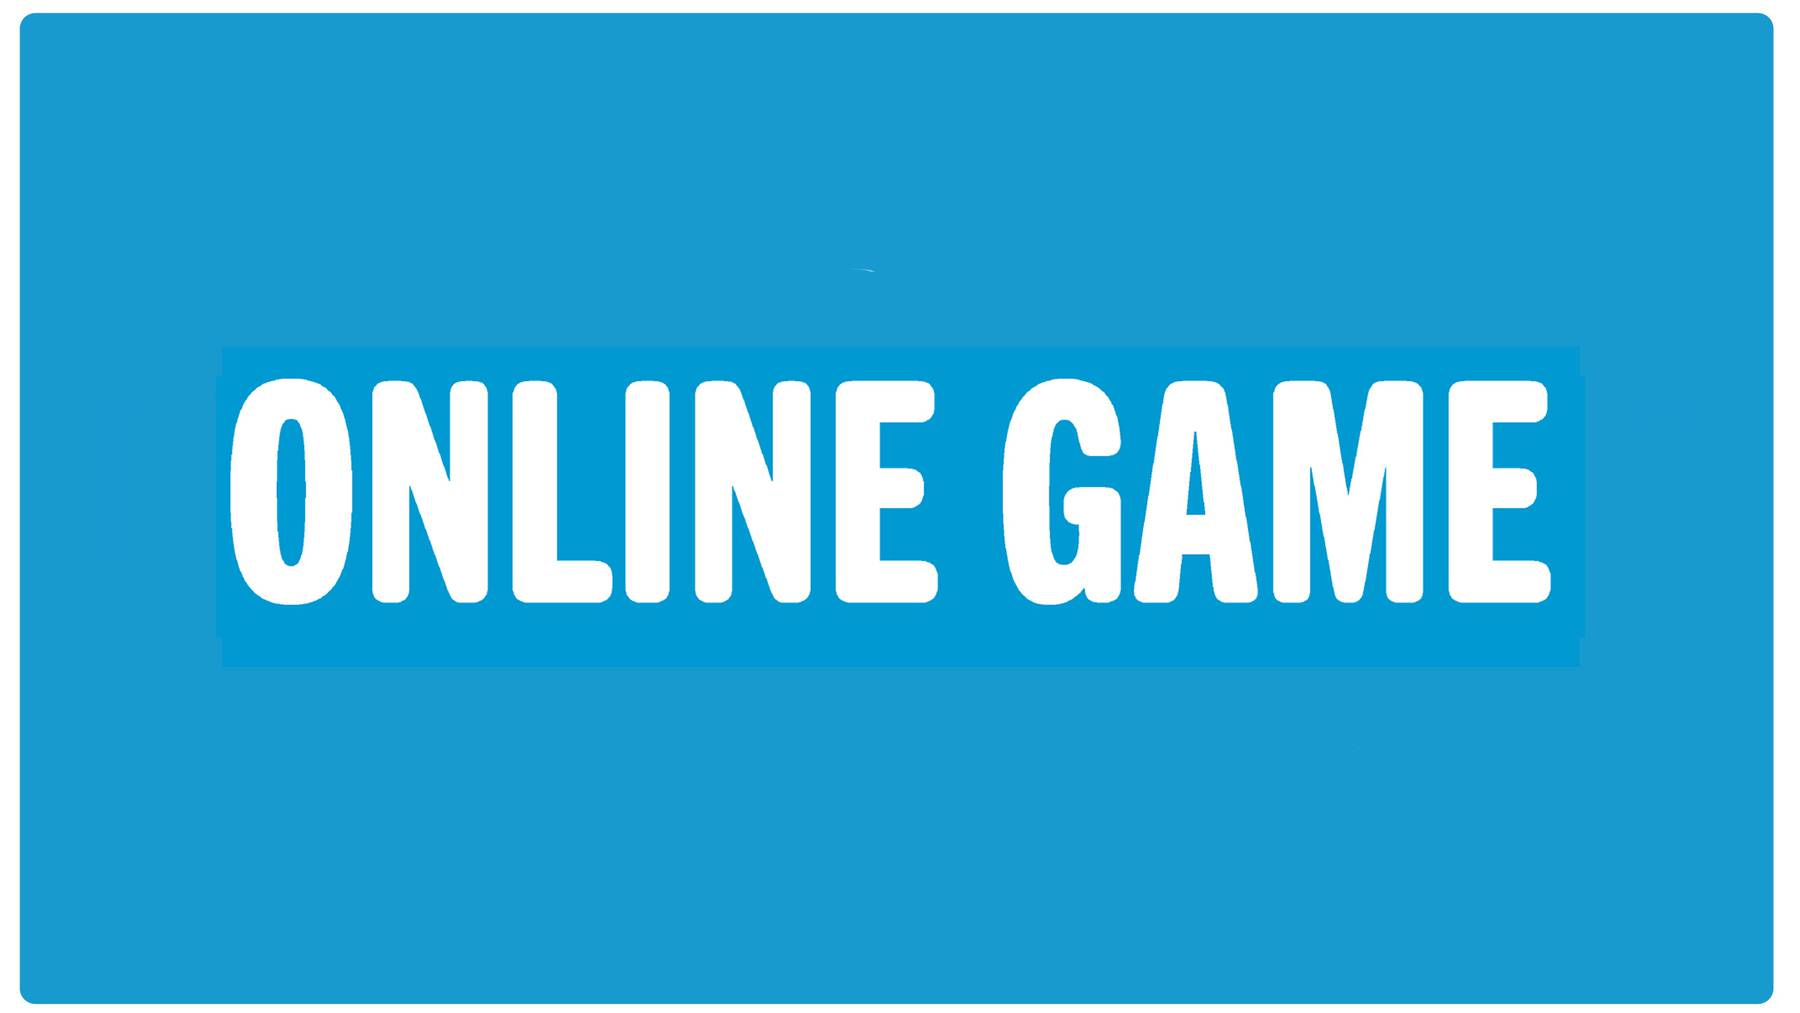 OnlineGame